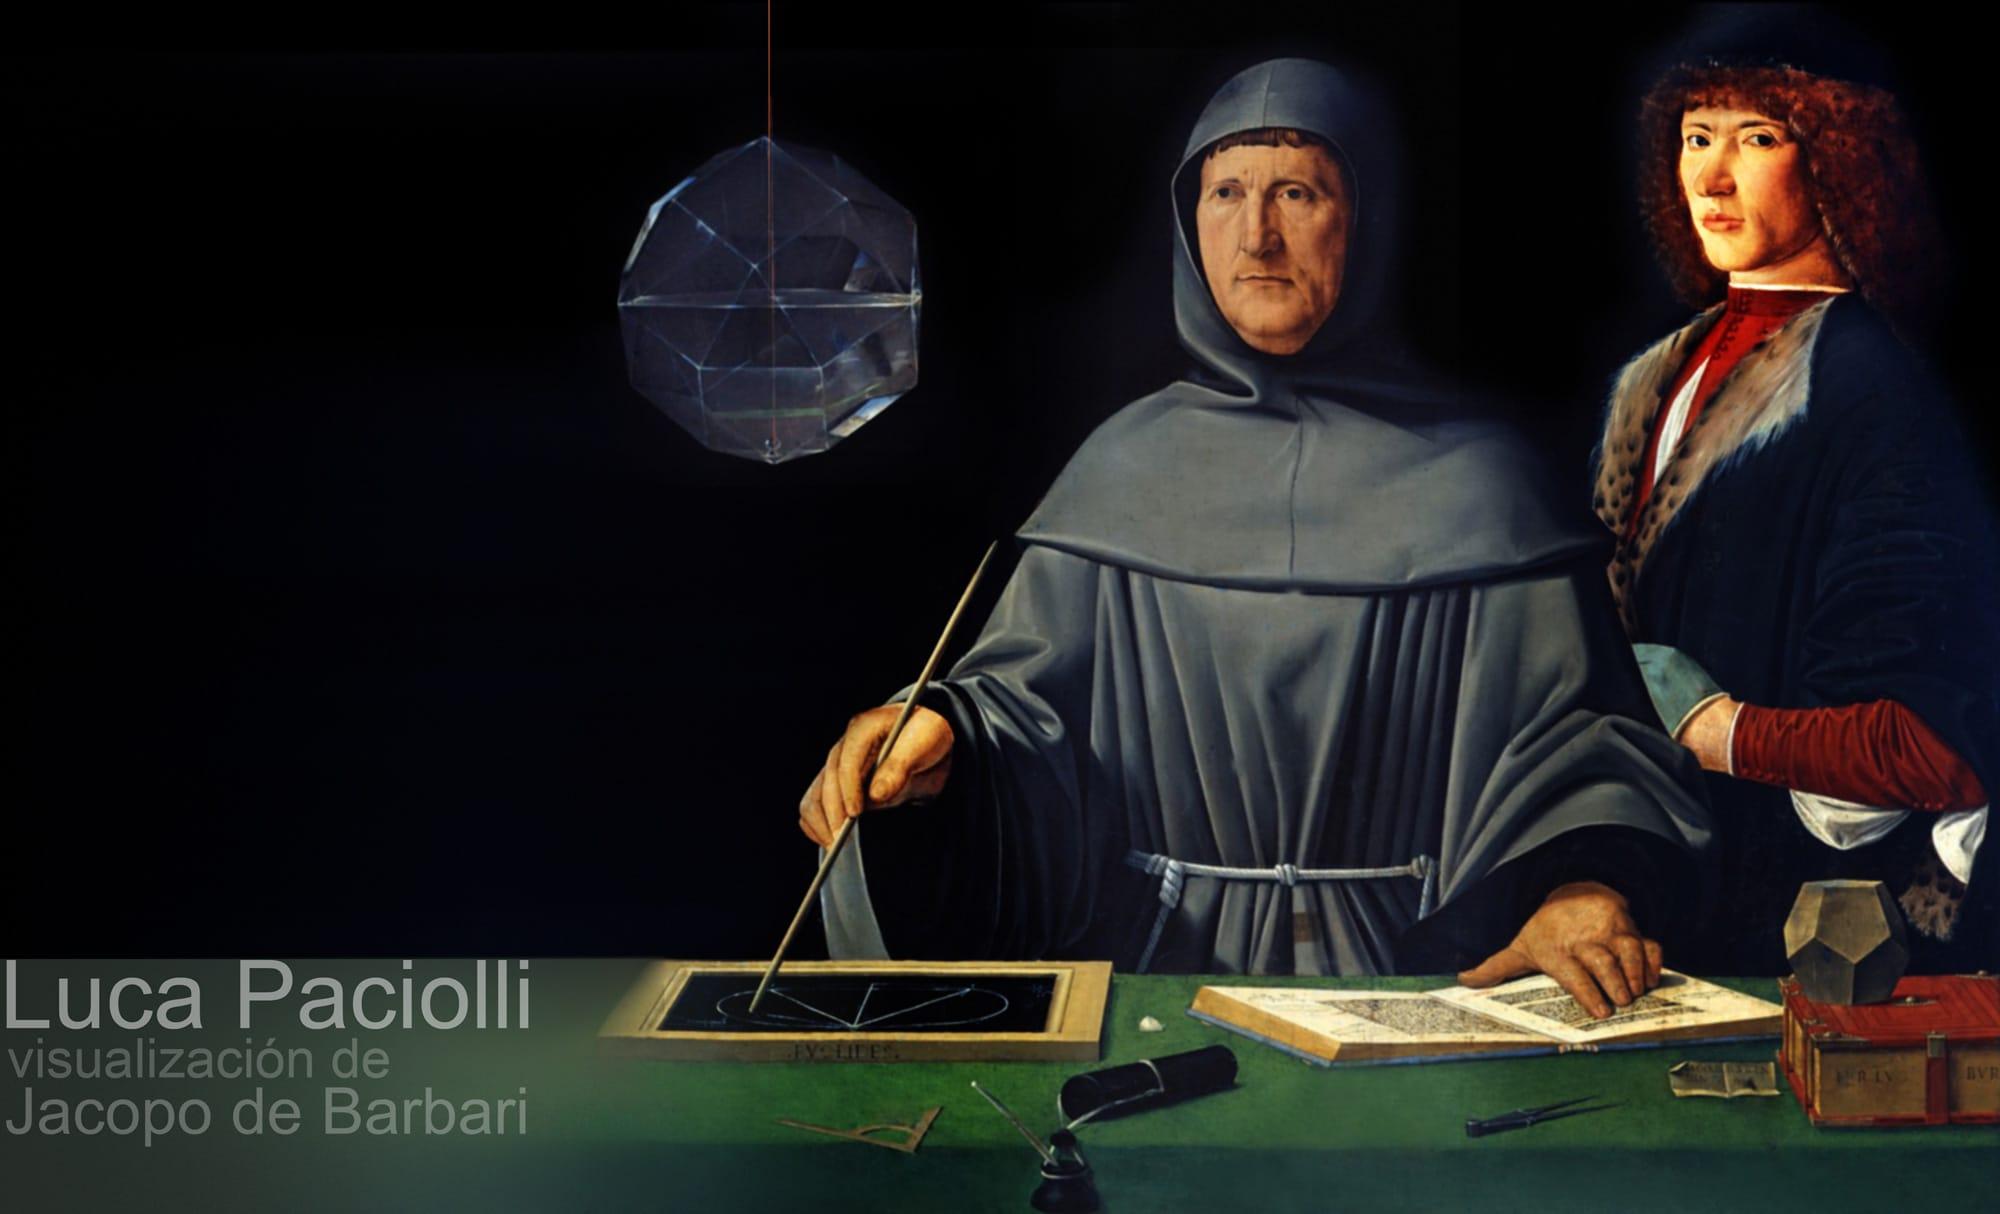 001LucaPaccioli_16130411962_o